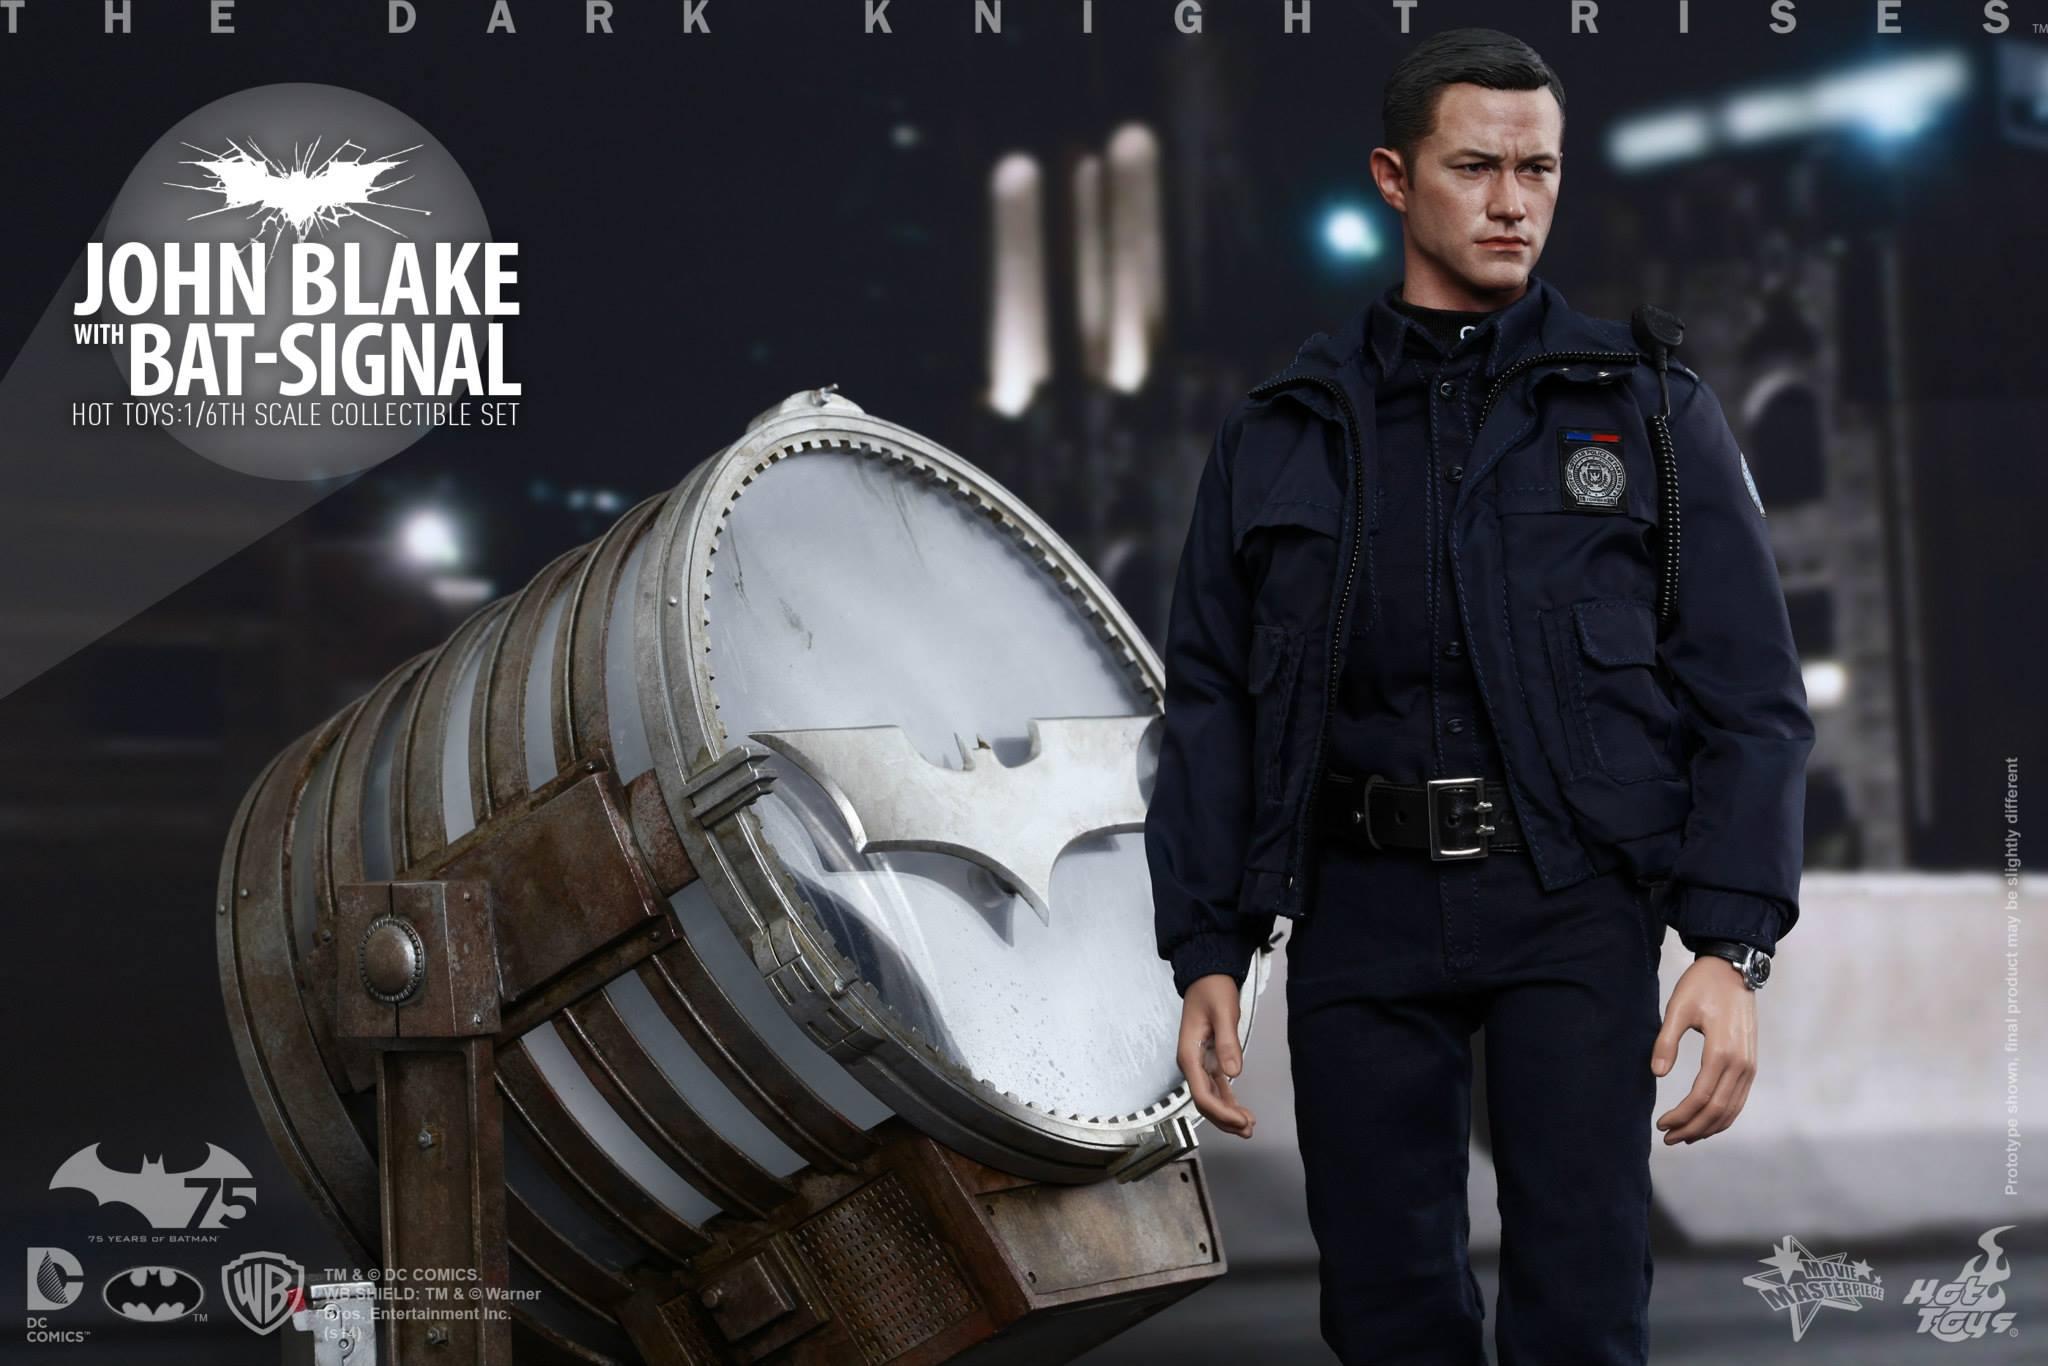 THE DARK KNIGHT RISES - Lt. JIM GORDON & JOHN BLAKE w/BATSIGNAL 367783102